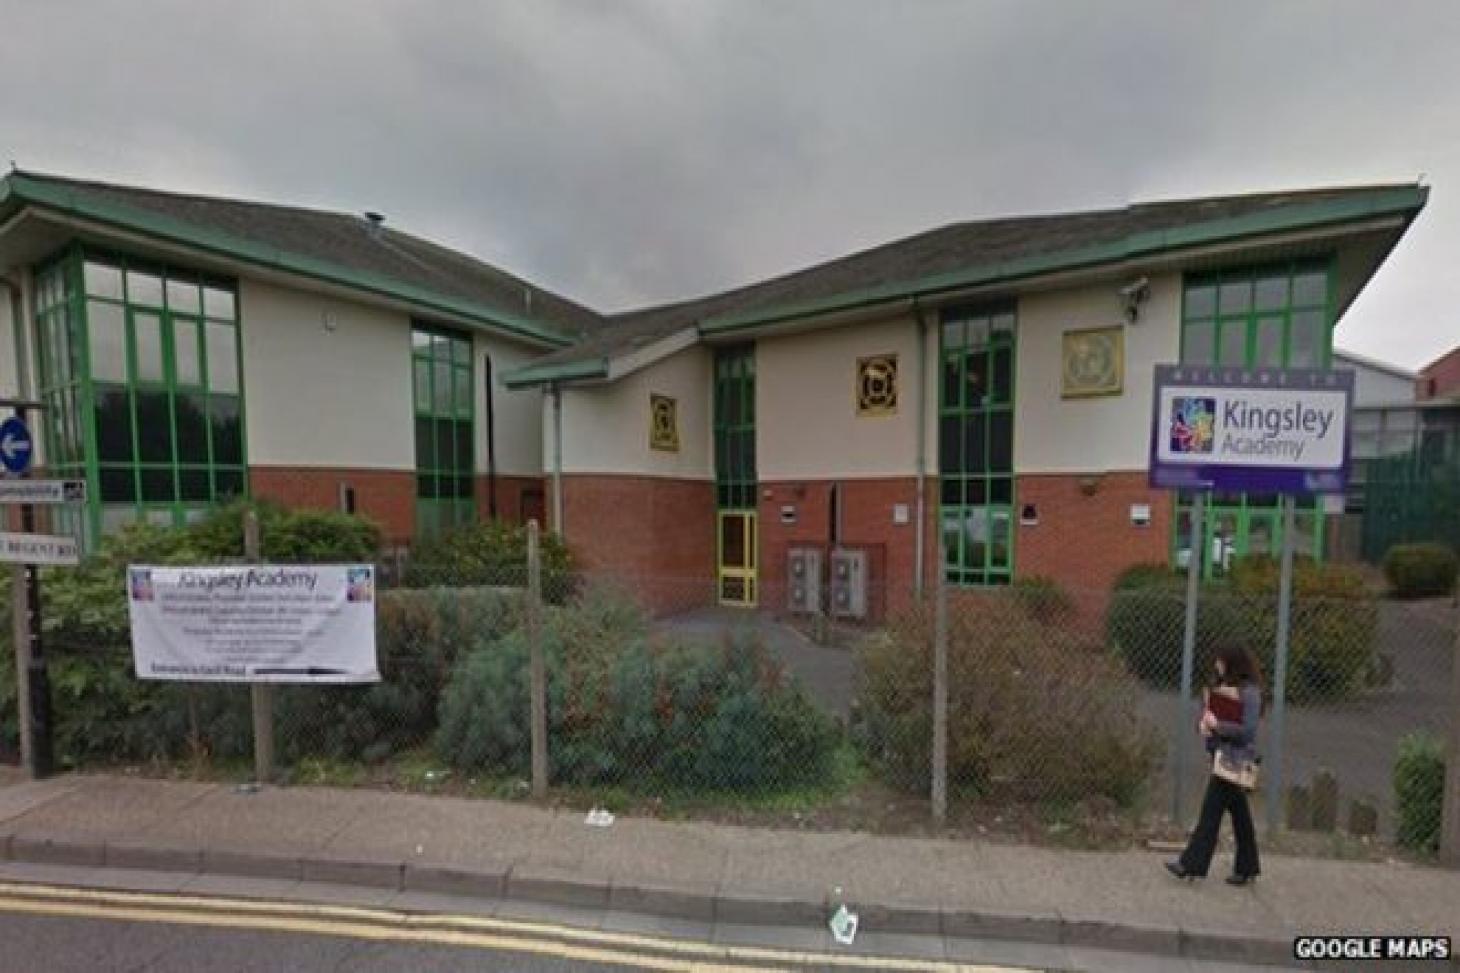 Kingsley Academy Nets | Sports hall cricket facilities